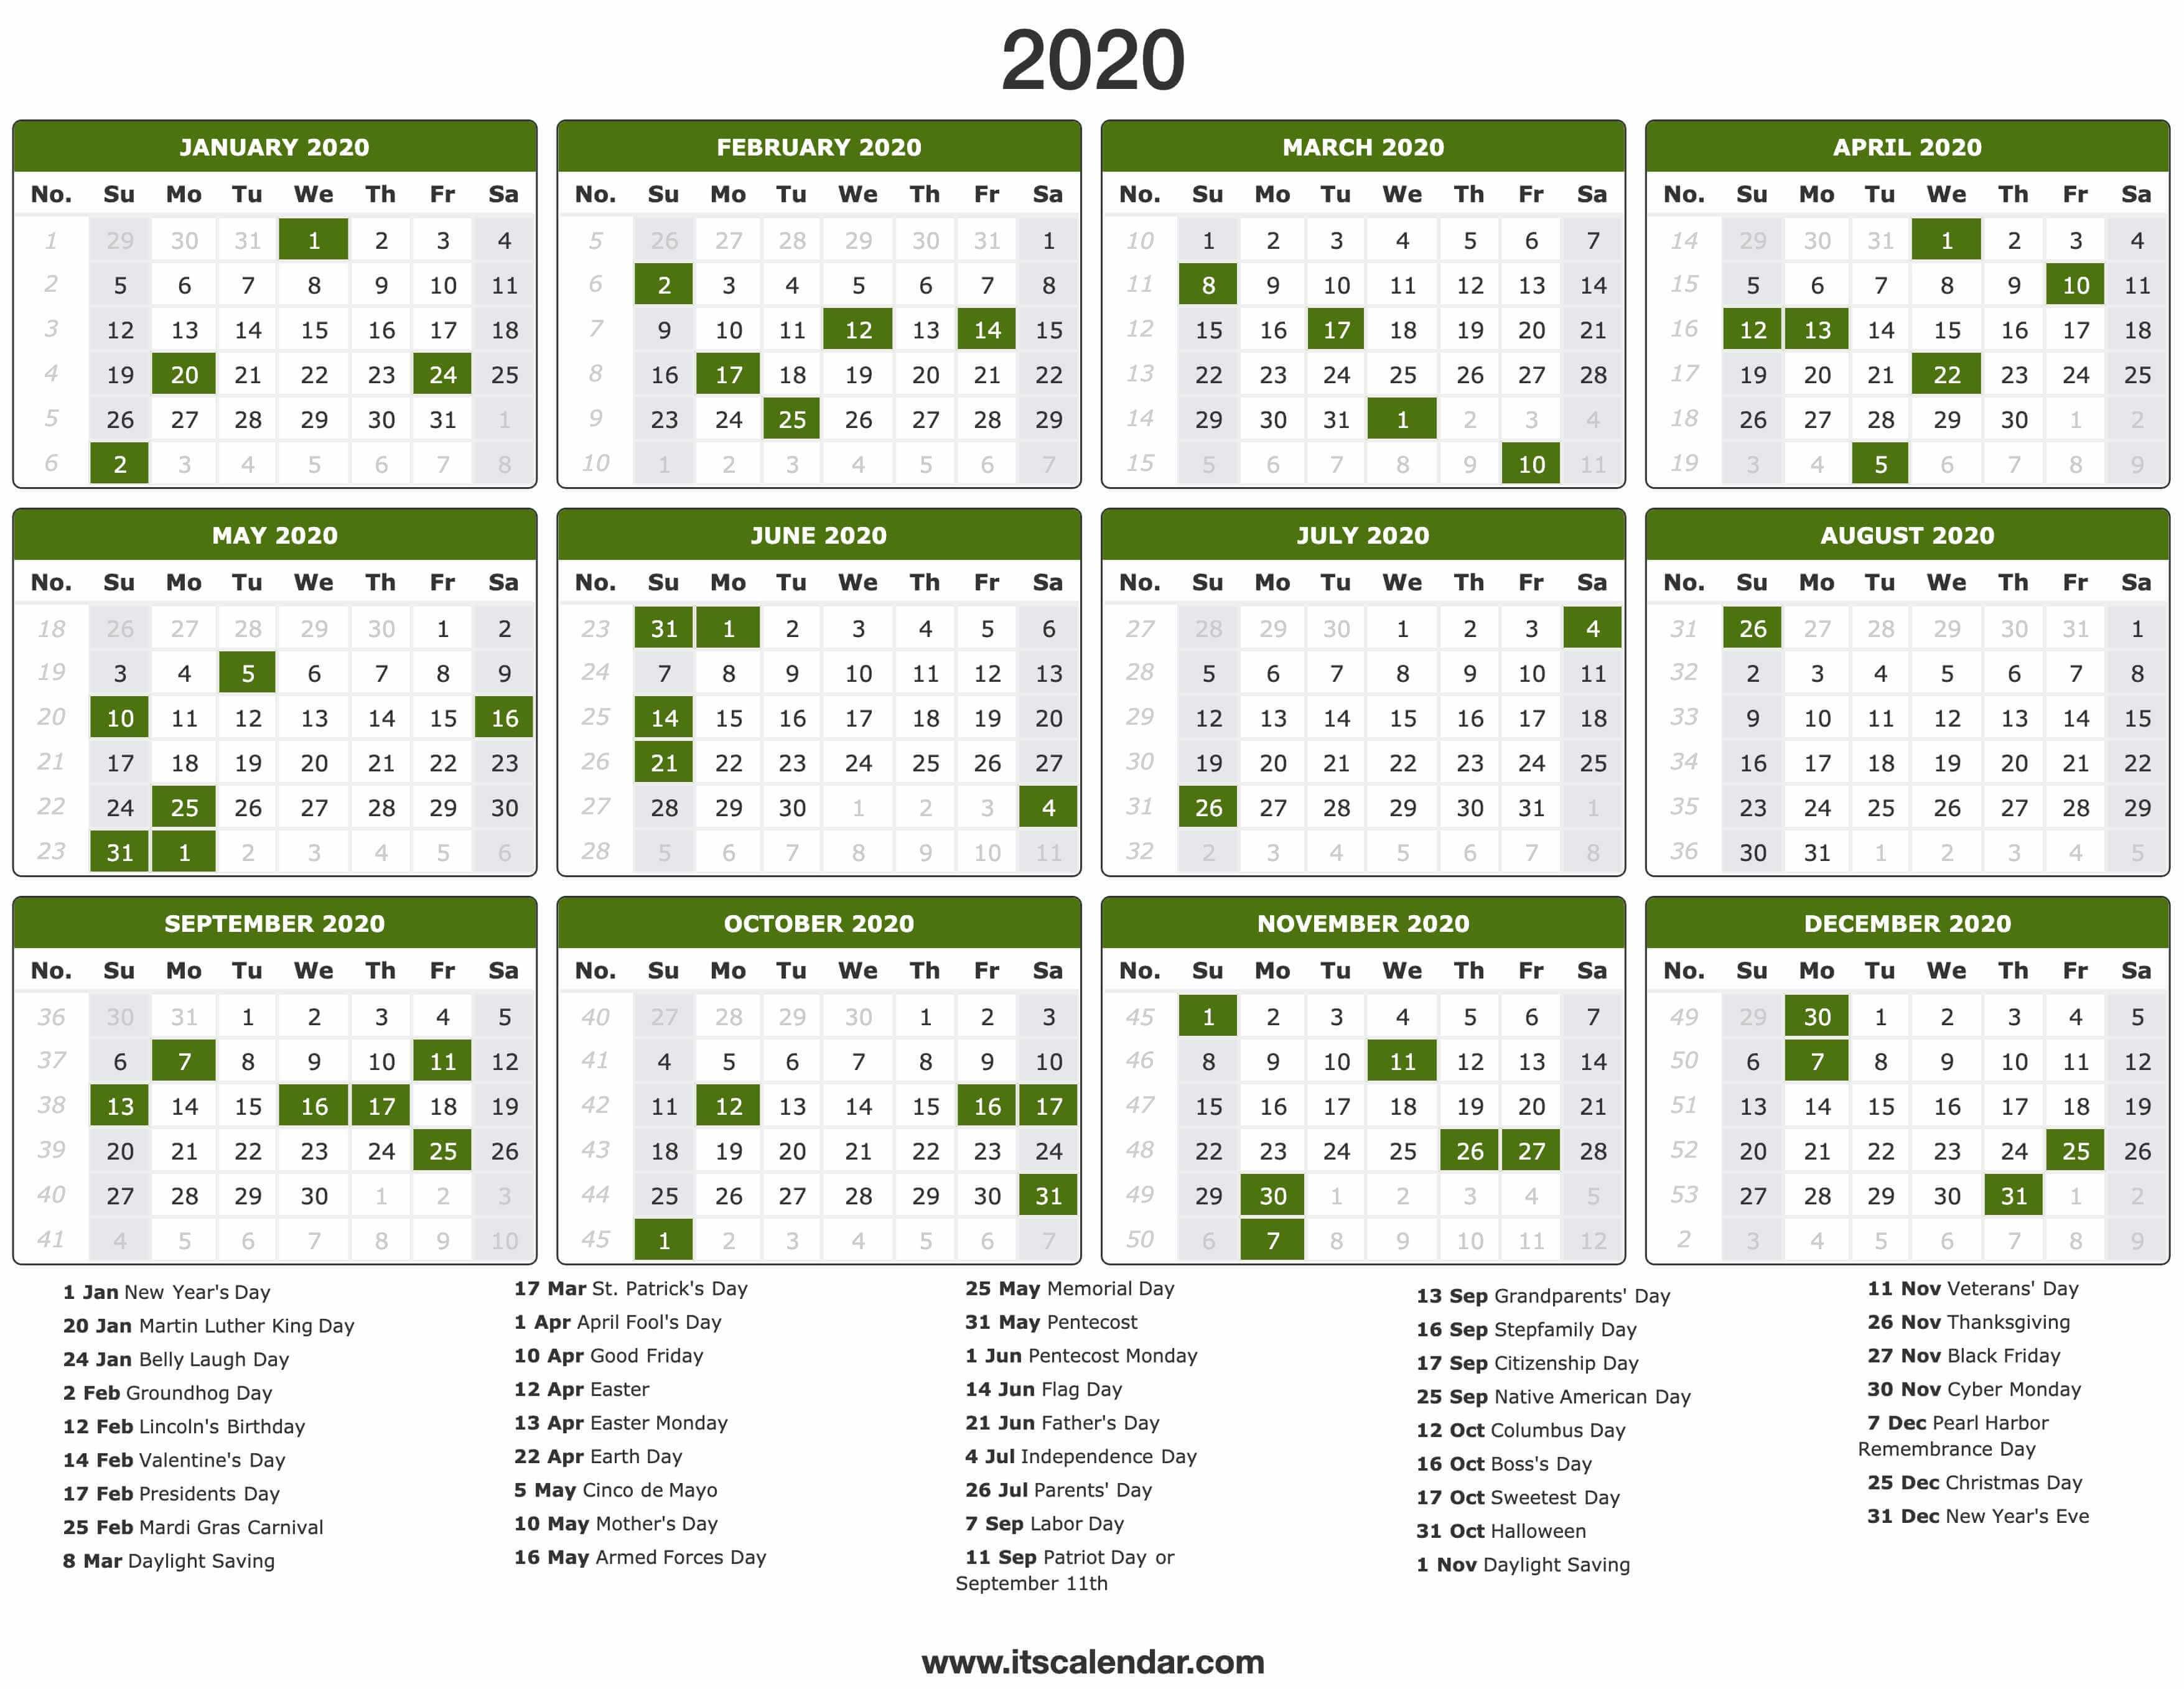 2020 2020 Calandar - Wpa.wpart.co